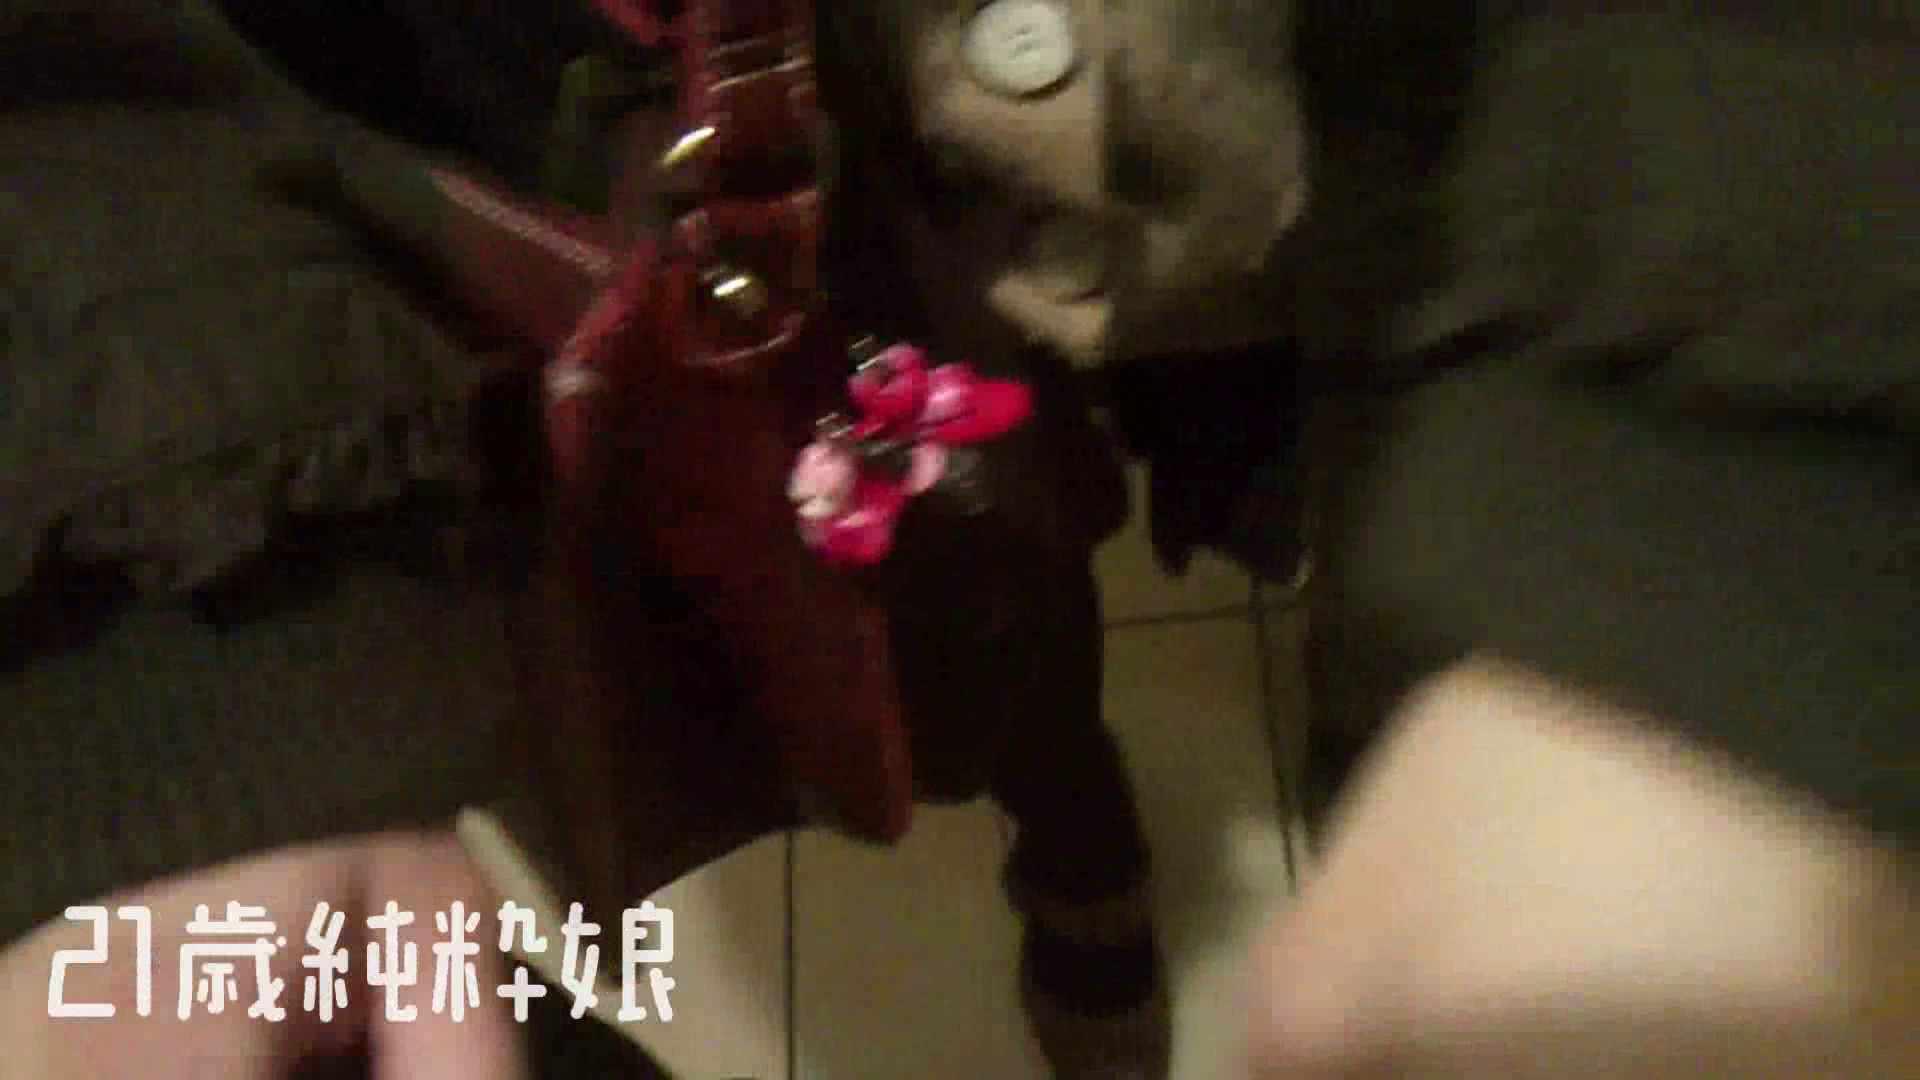 Gカップ21歳純粋嬢第2弾Vol.5 学校 オメコ動画キャプチャ 77pic 26